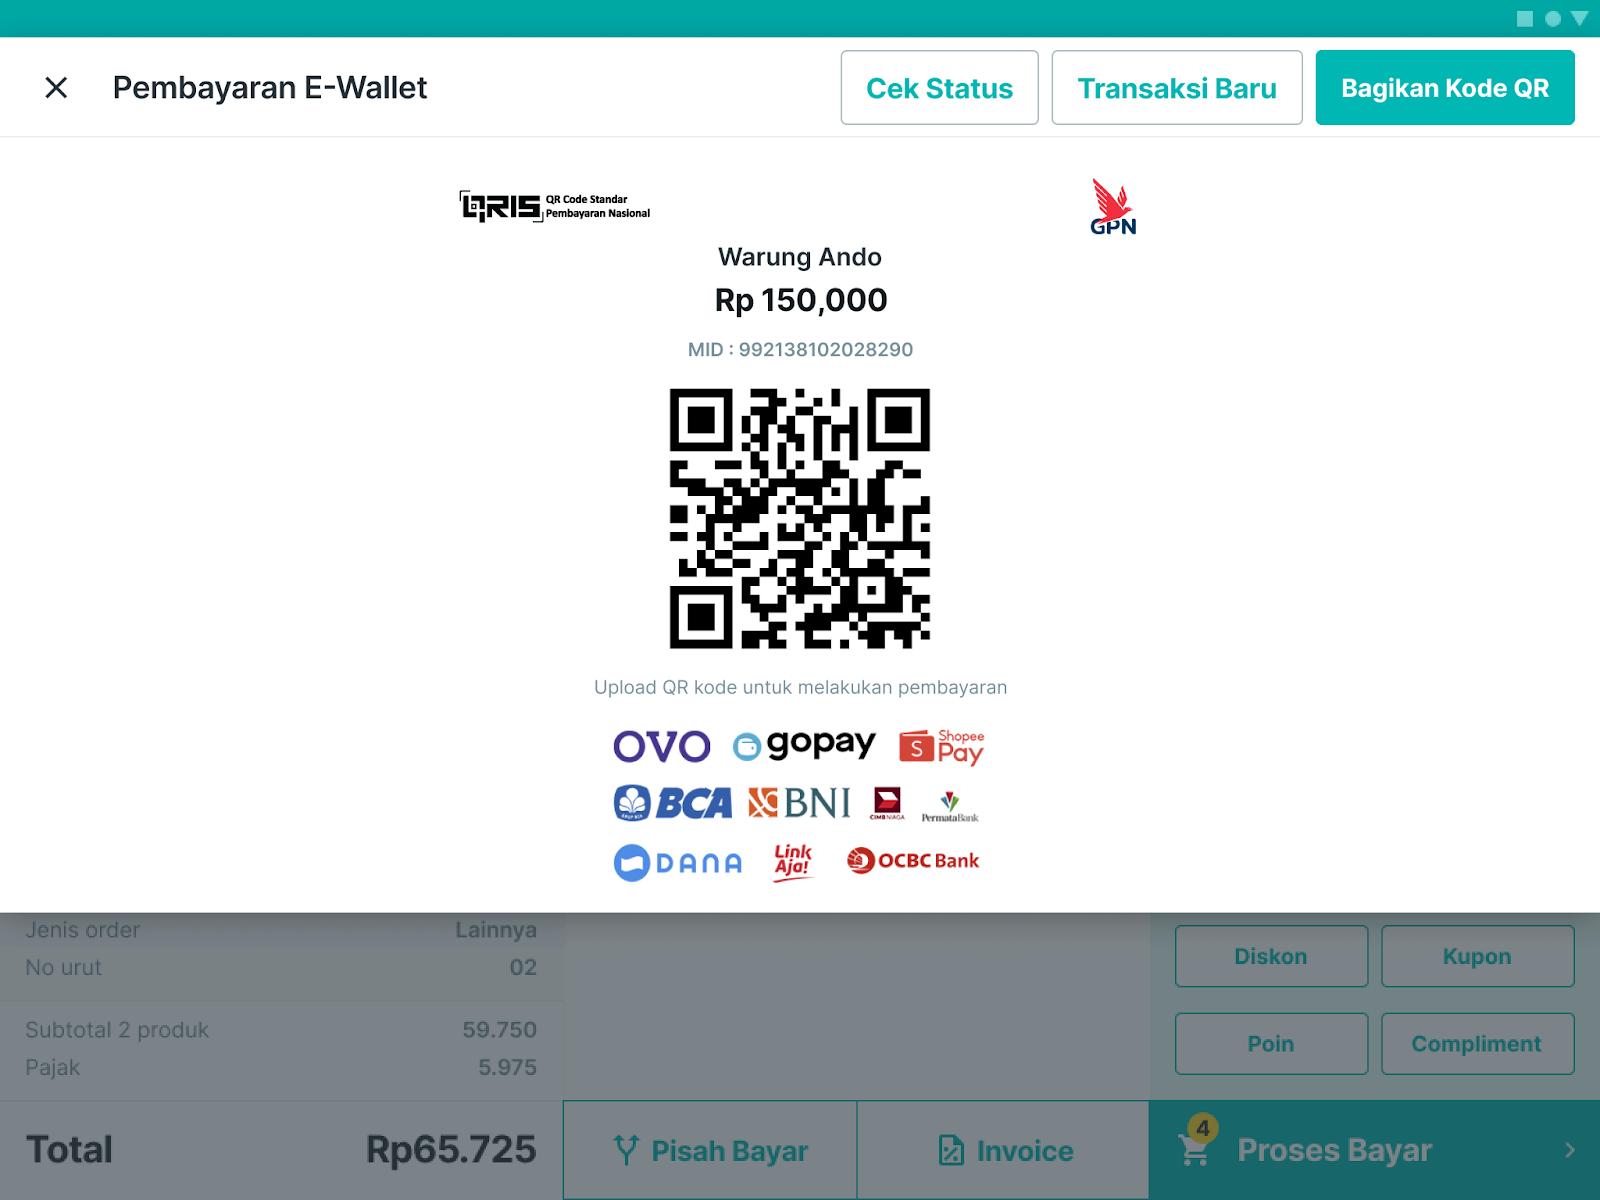 Gunakan fitur e-wallet majoo yang dapat diandalkan